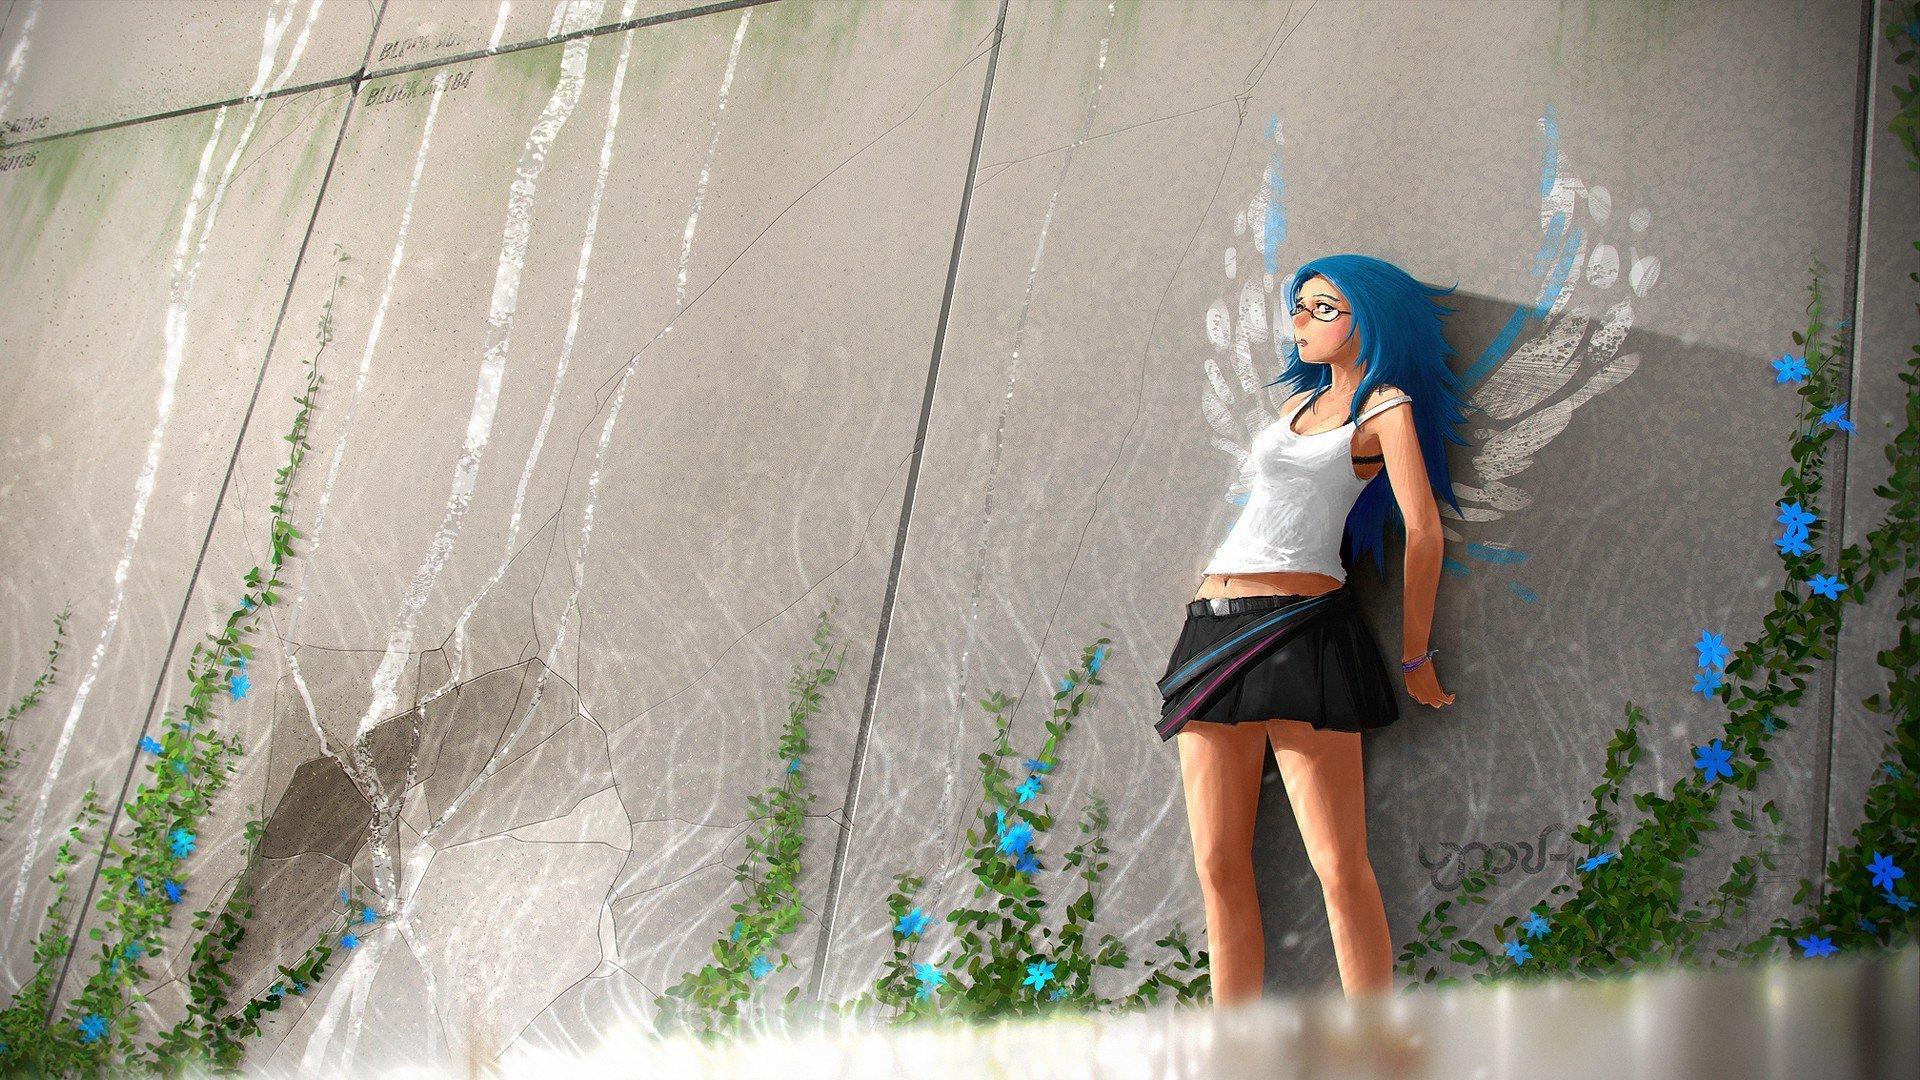 Anime Girl Mini Skirt, HD Anime, 4k Wallpapers, Images